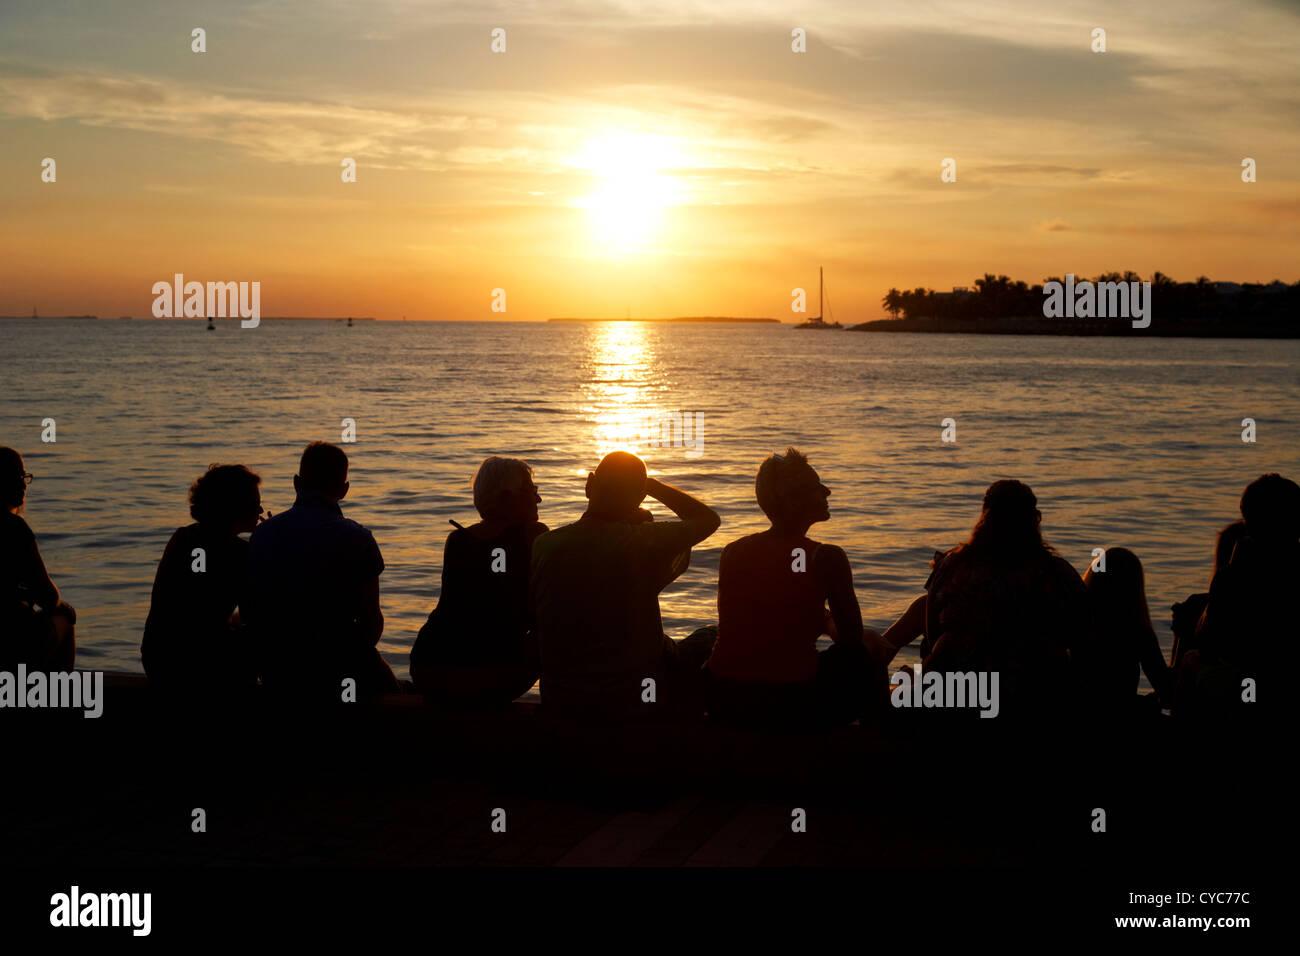 people waiting on waterfront for evening sunset celebrations mallory square key west florida usa - Stock Image